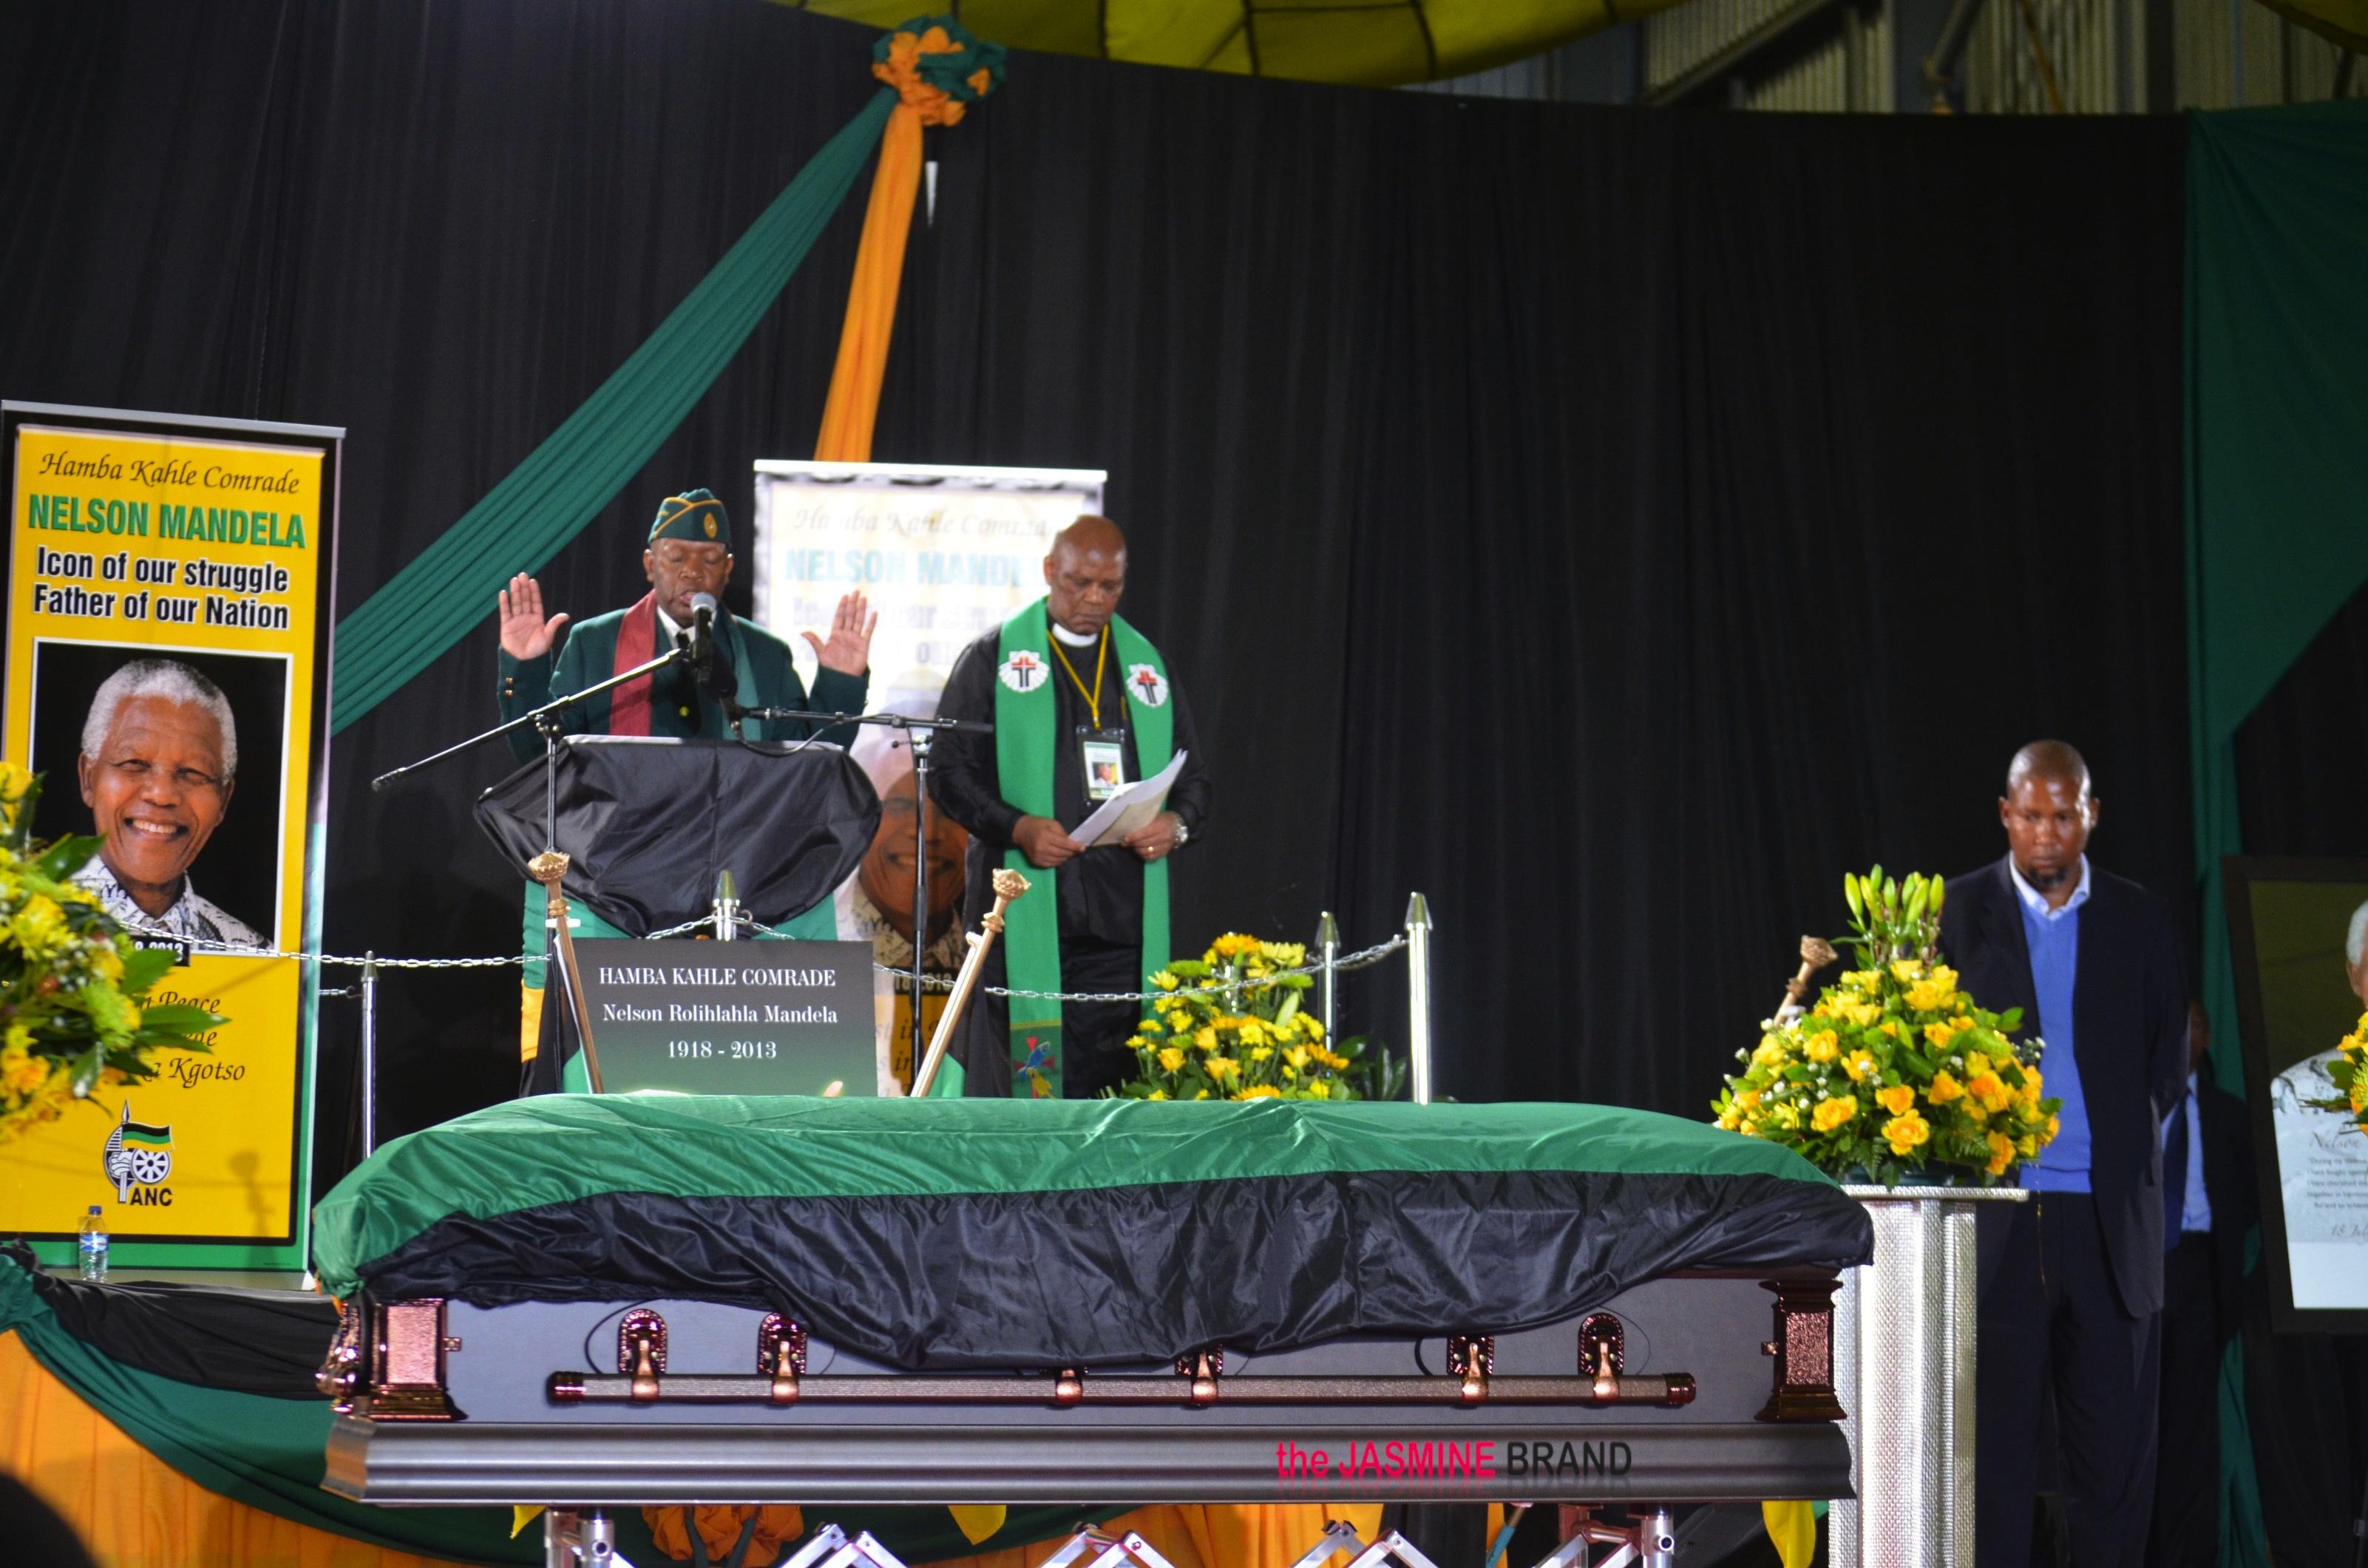 Nelson Mandela Laid to Rest, Oprah Winfrey & Jesse Jackson Attend ...